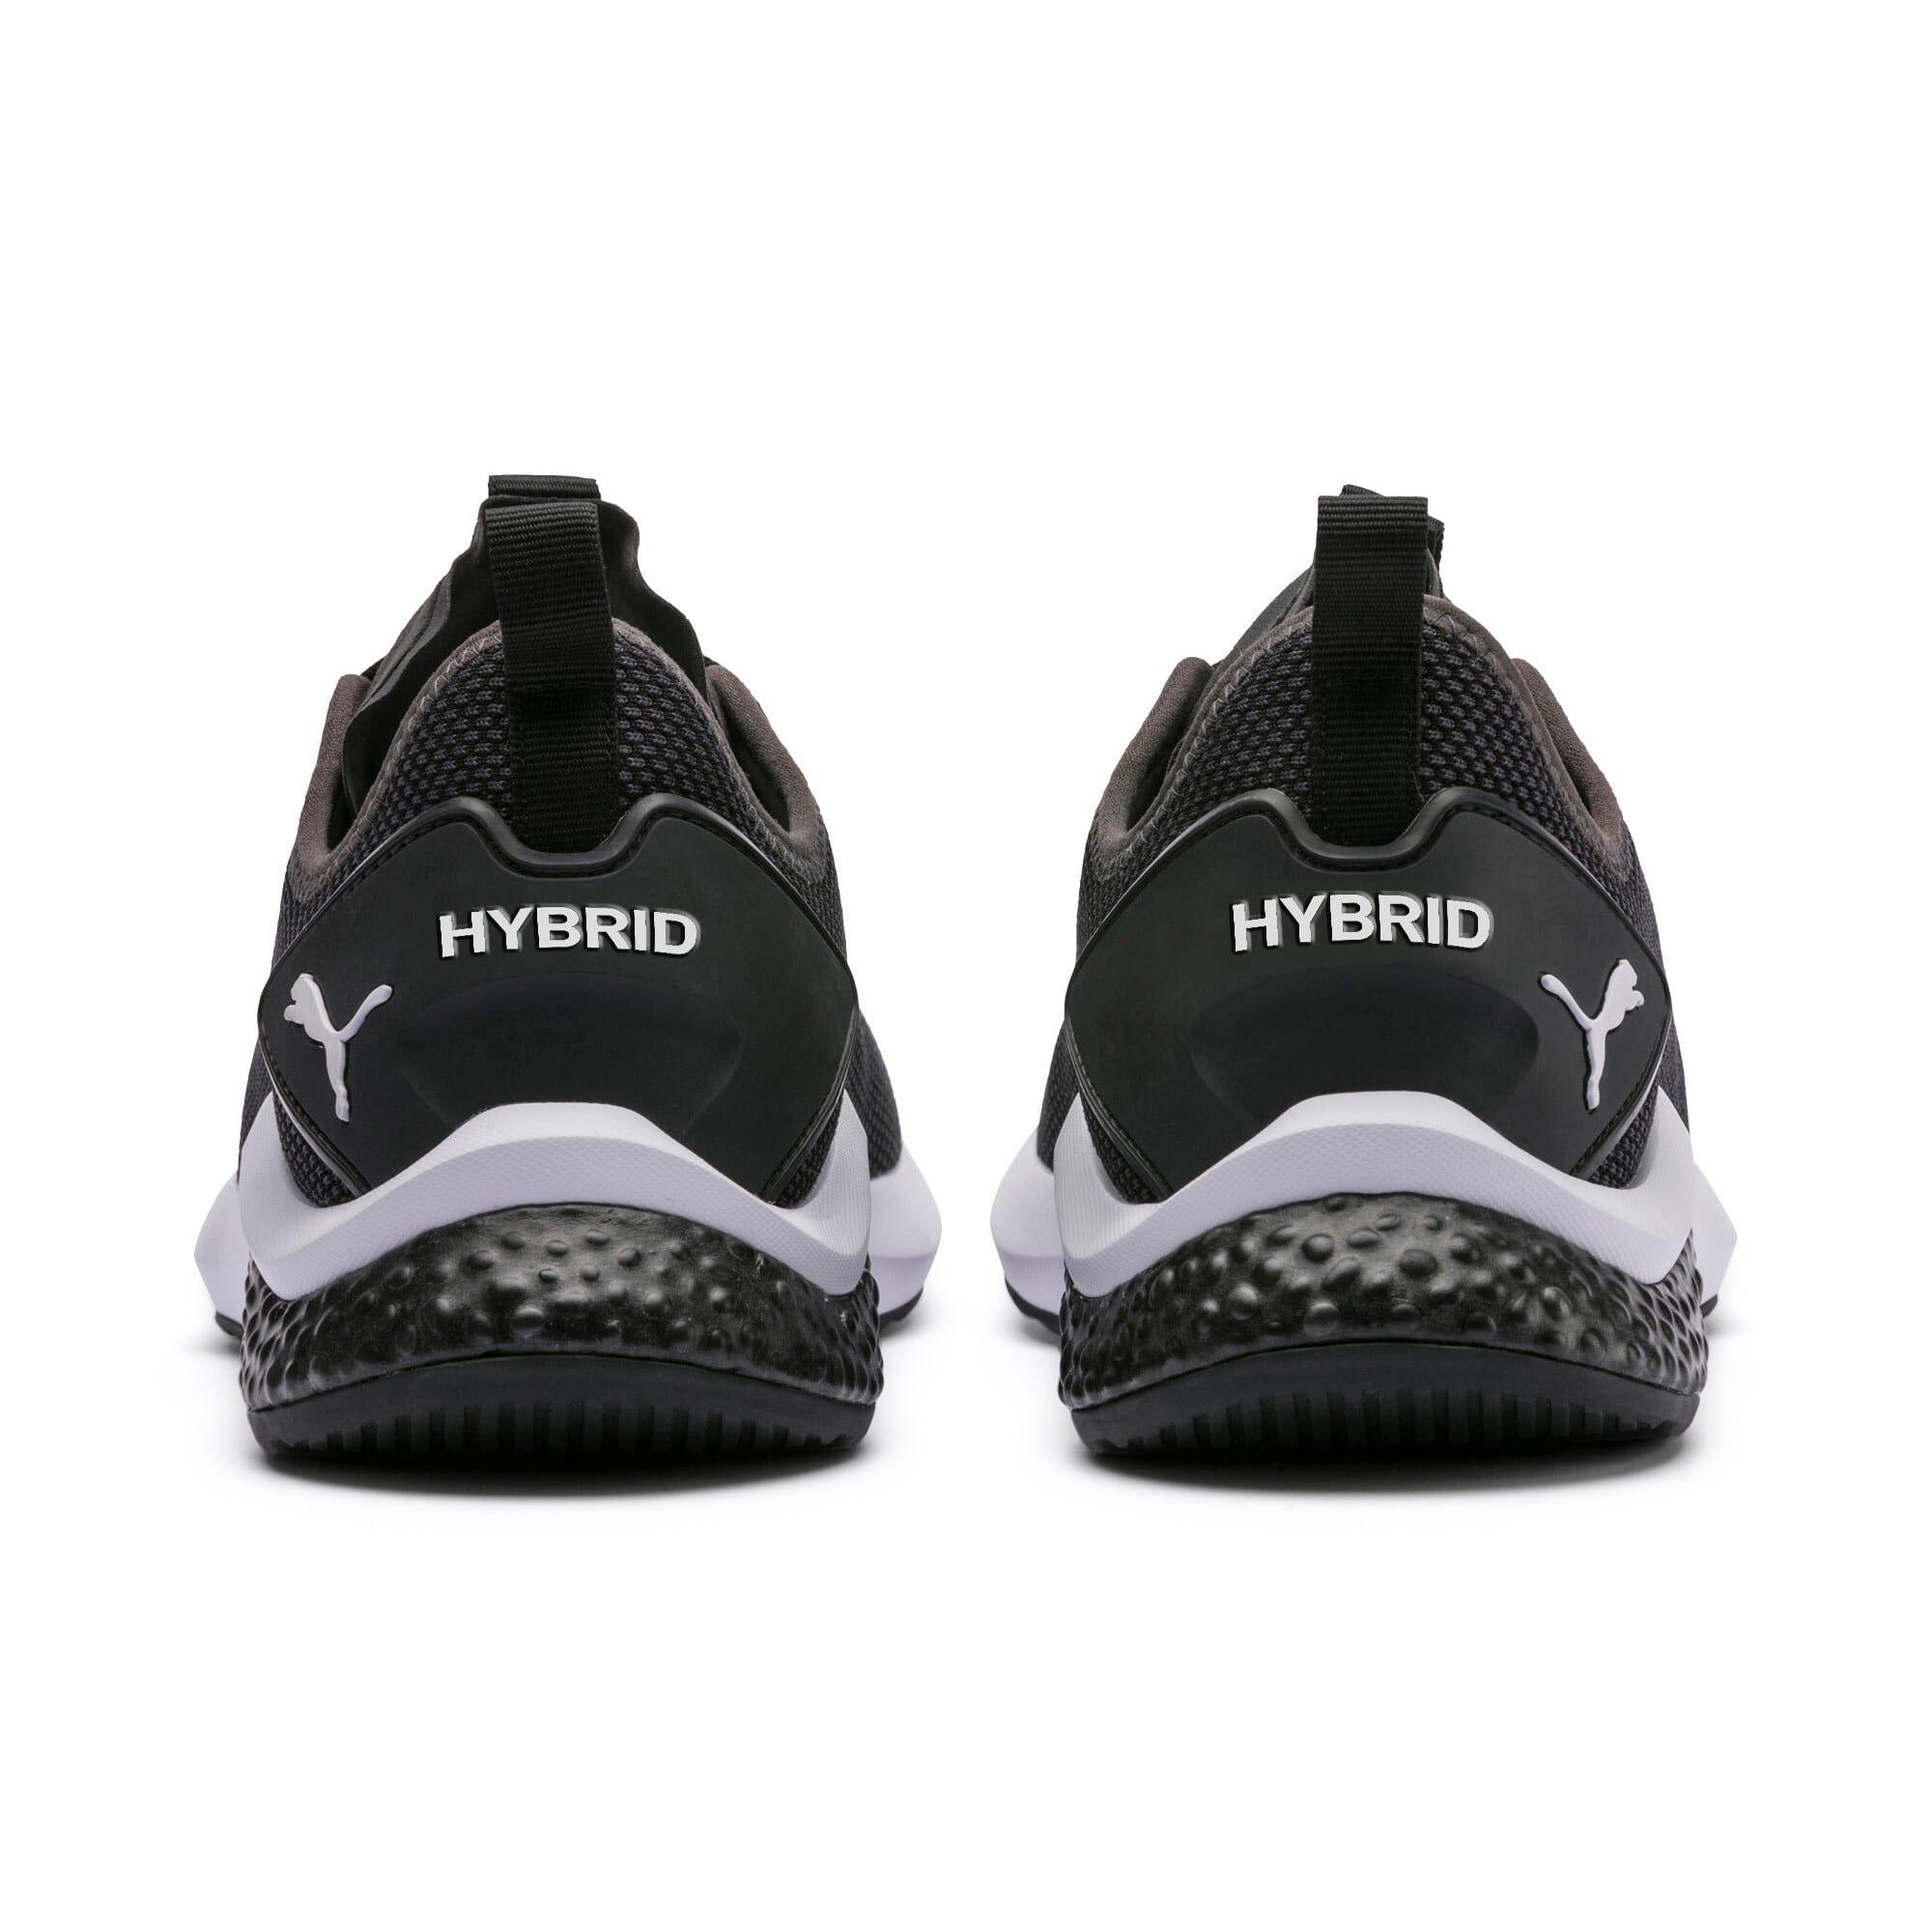 Thumbnail 4 of HYBRID NX hardloopschoenen voor heren, Puma Black-Puma White, medium